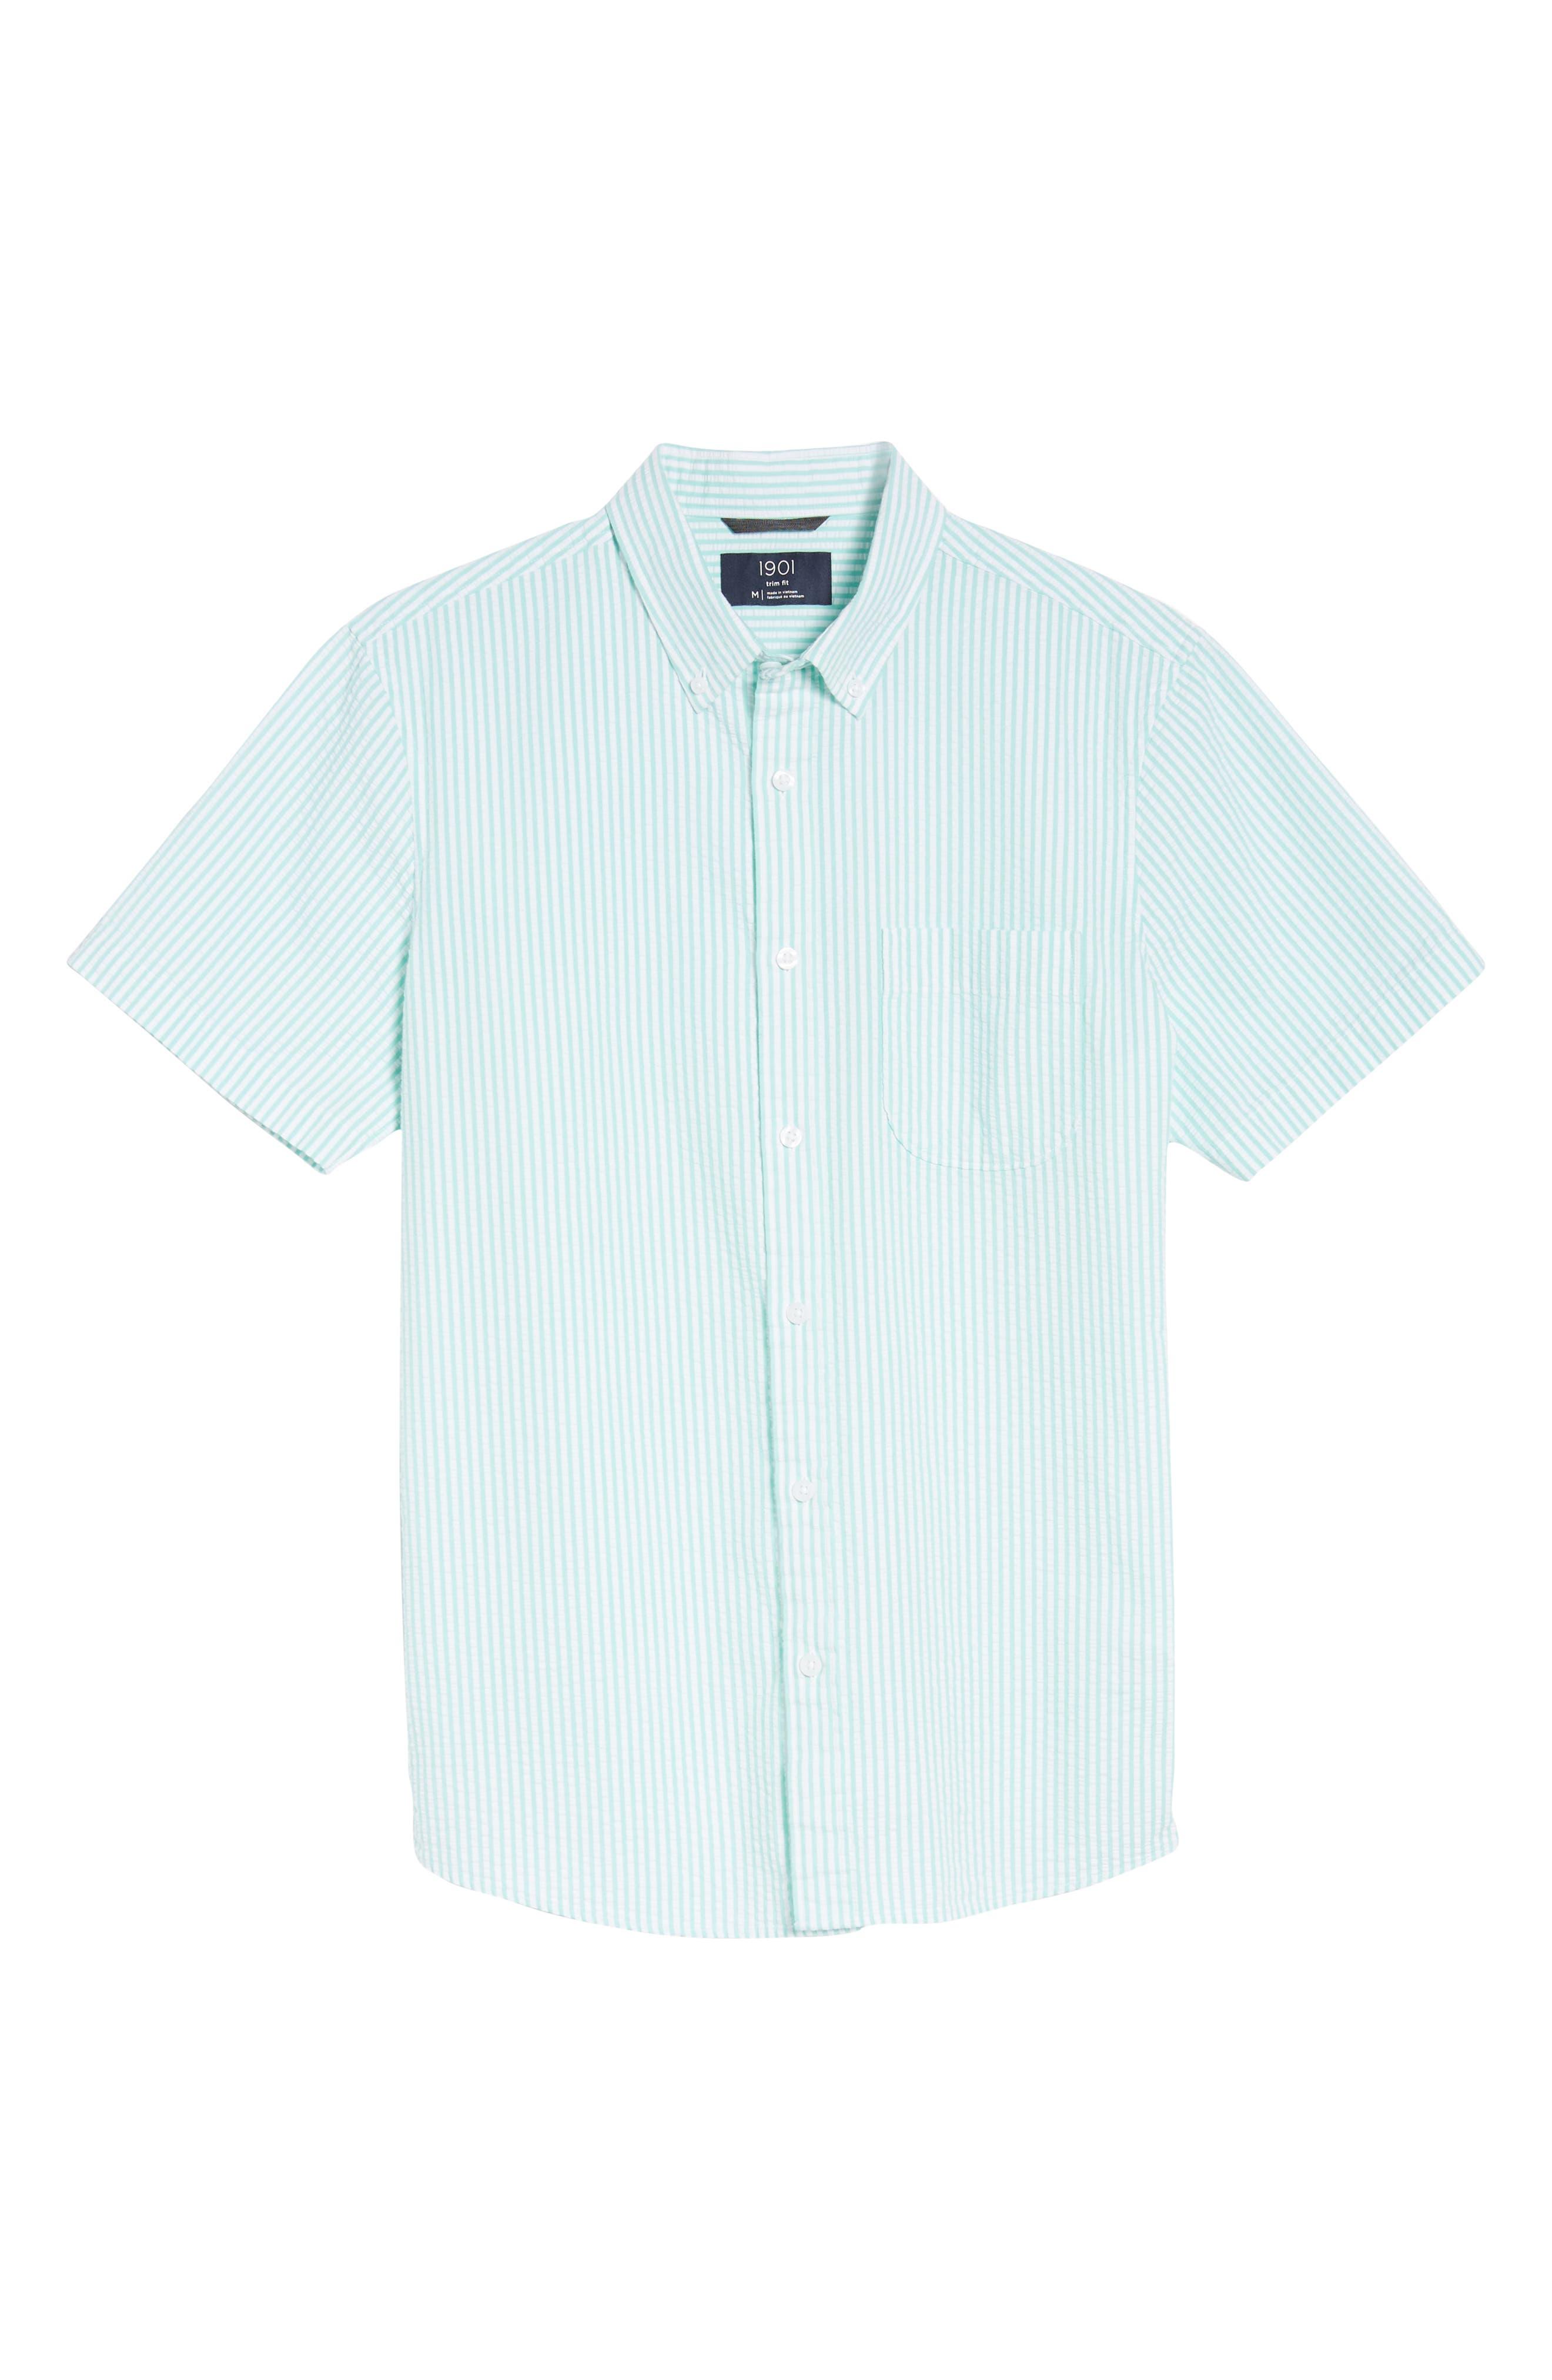 Trim Fit Seersucker Short Sleeve Sport Shirt,                             Alternate thumbnail 6, color,                             White Green Seersucker Stripe